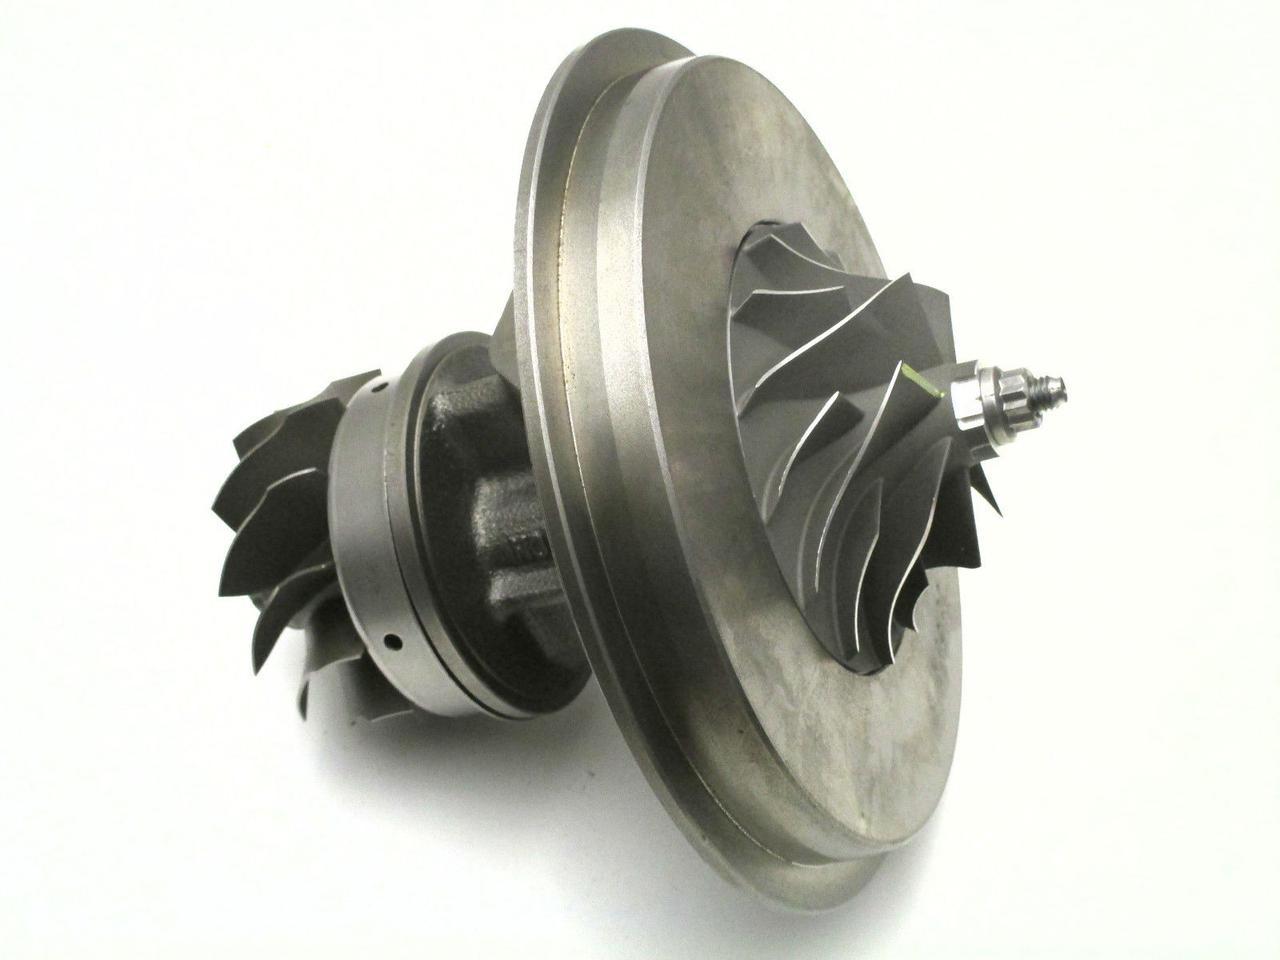 Картридж турбины Fiat Tipo/Tempra TDS, M.710.BT.19.O/160B6.046, (1990-), 1.9D, 59,68/80,92